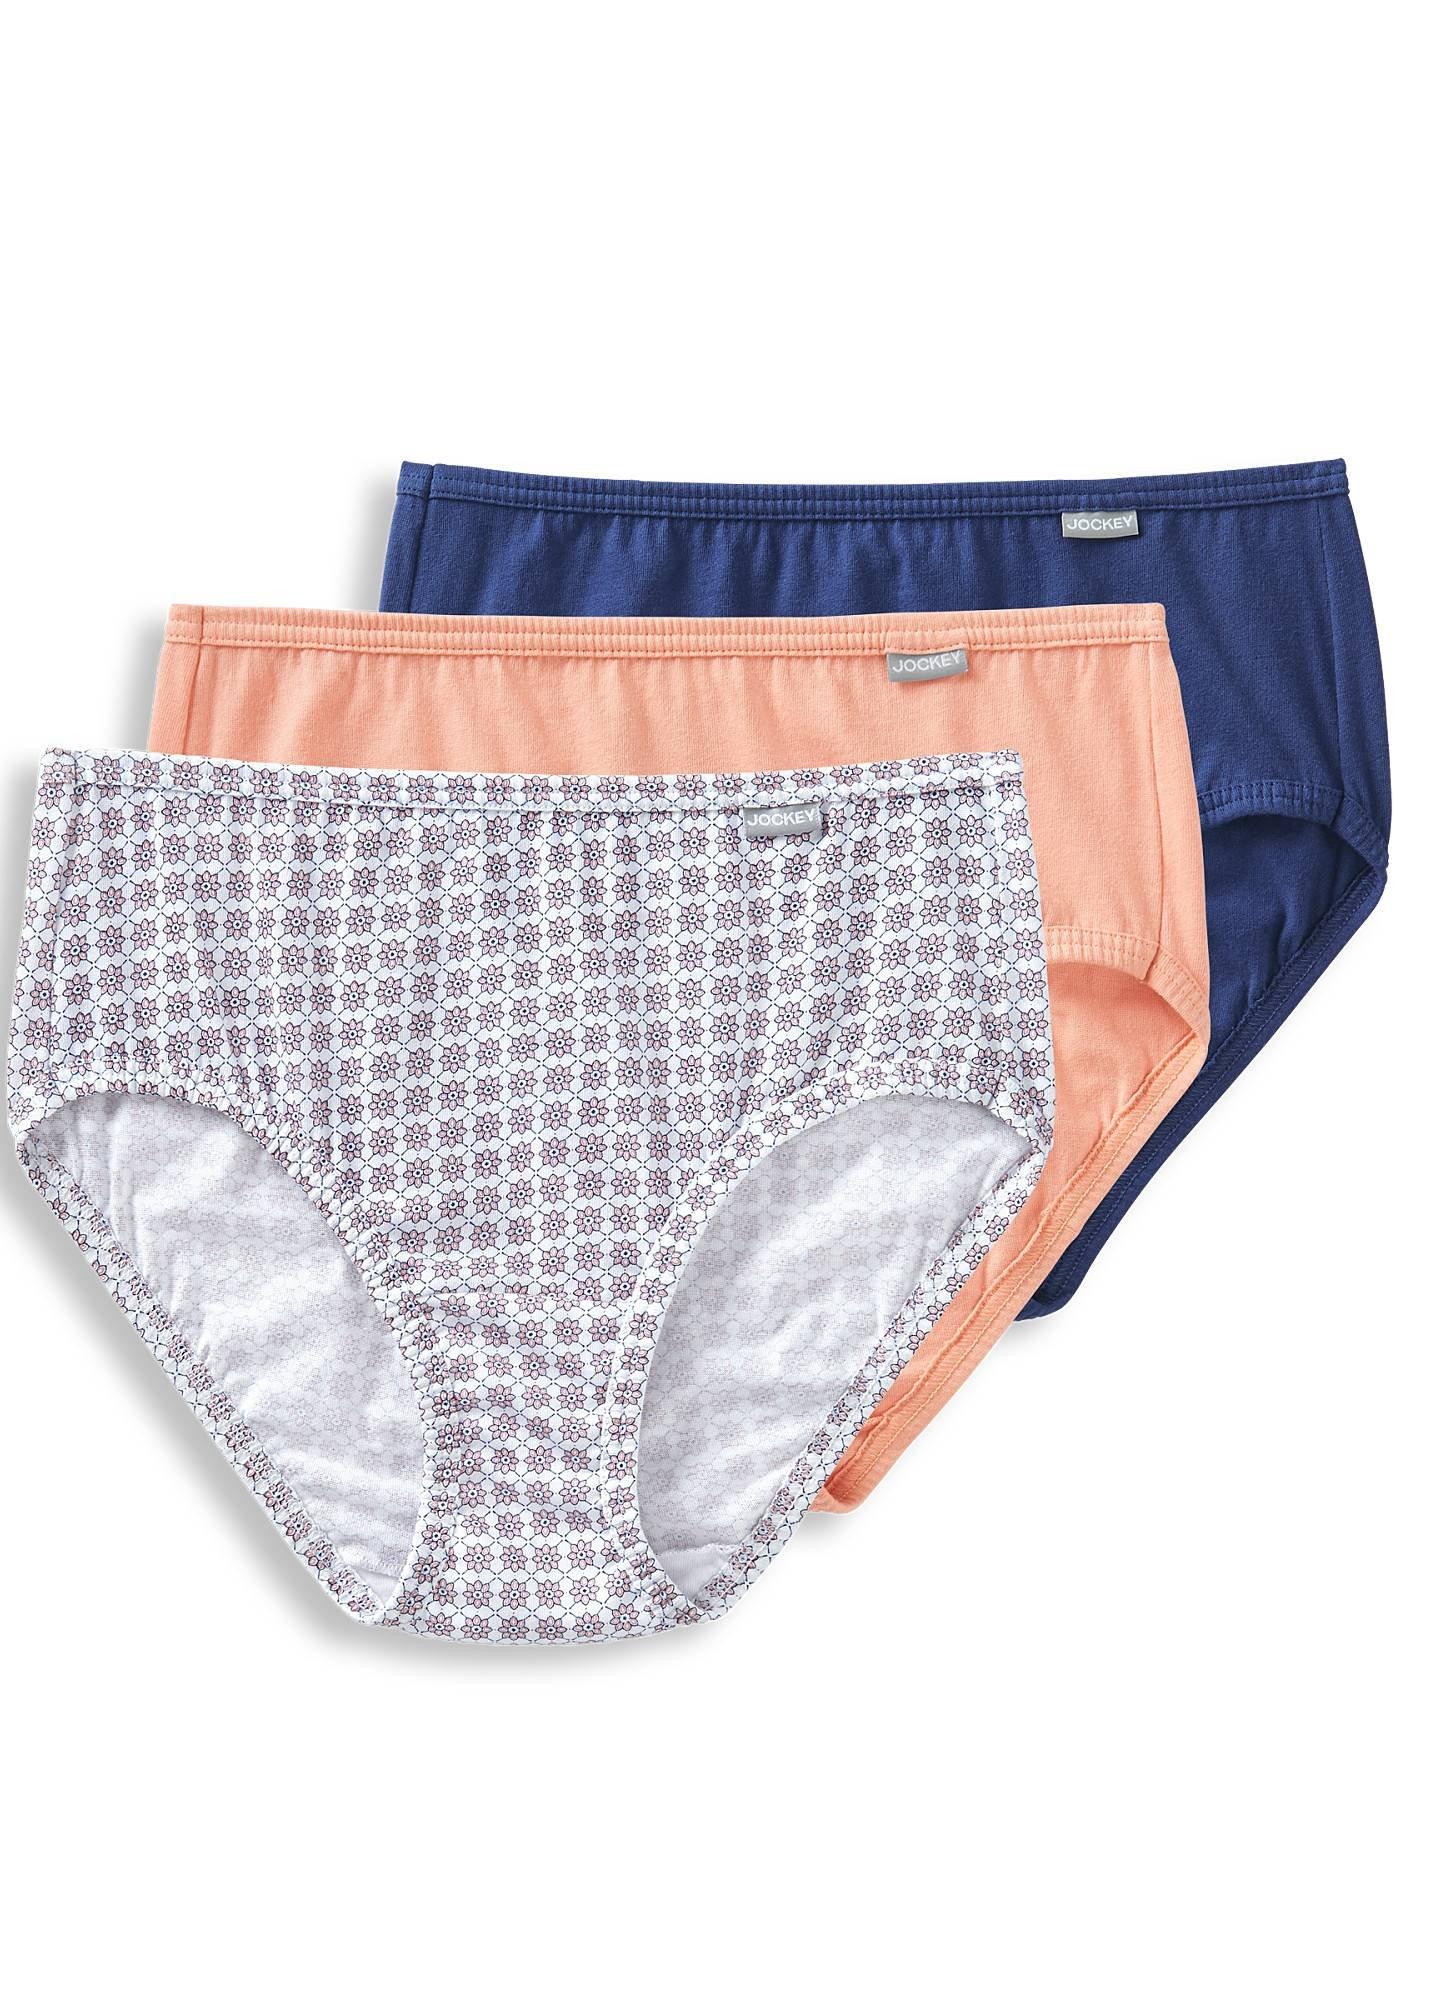 177485a20 Galleon - Jockey Women s Underwear Plus Size Elance Hipster - 3 Pack ...